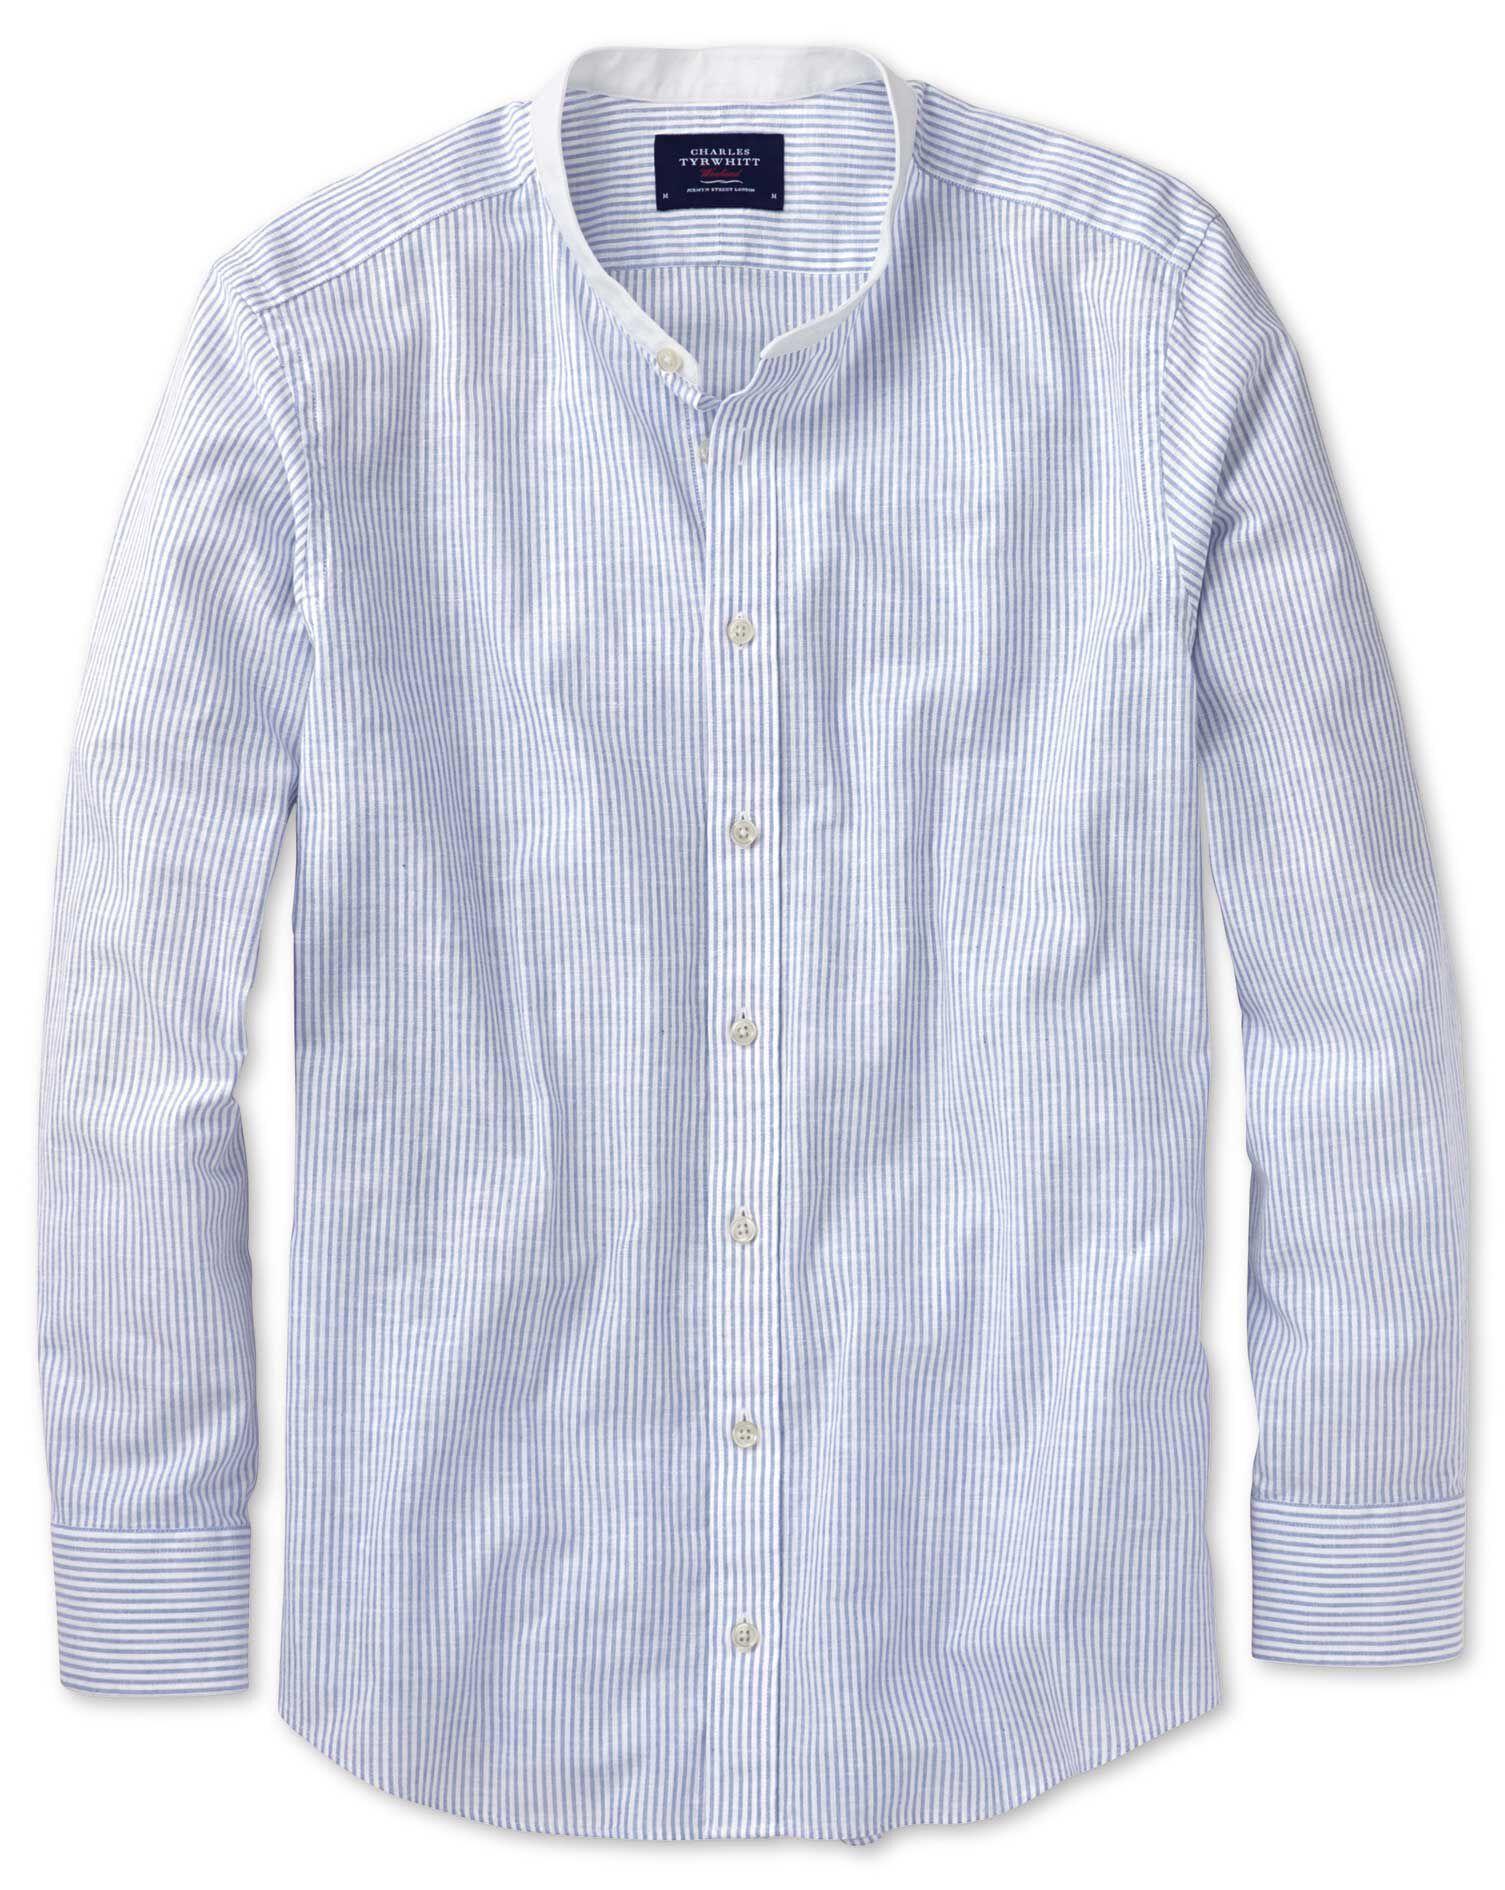 Slim Fit Collarless Mid Blue Stripe Cotton Shirt Single Cuff Size Medium by Charles Tyrwhitt